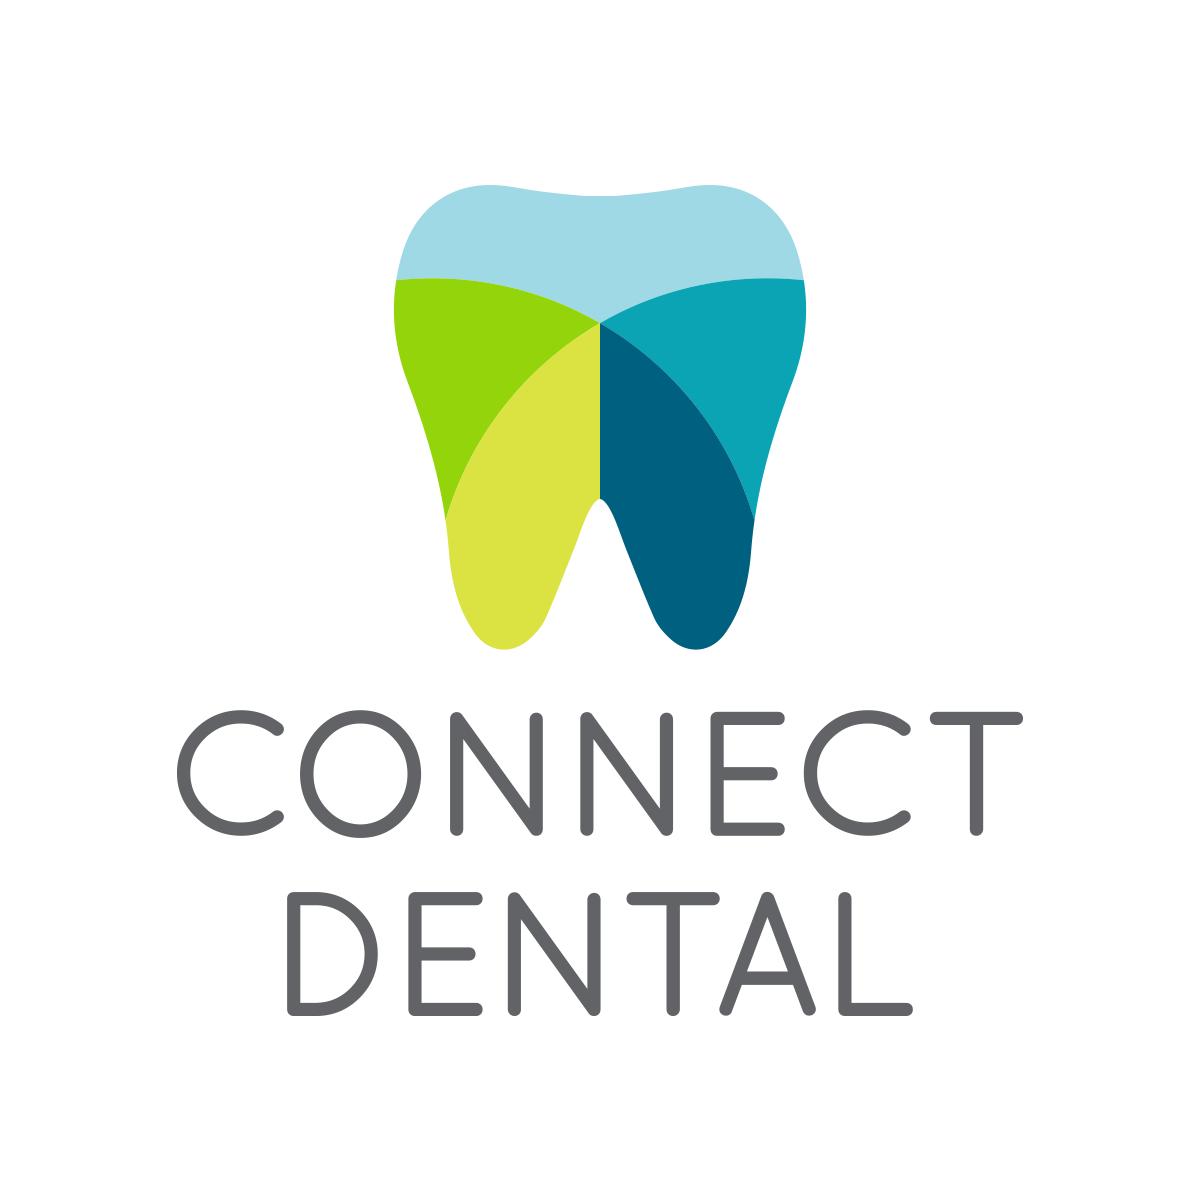 ConnectDentalSpecialists_logo_Sq_v2.png